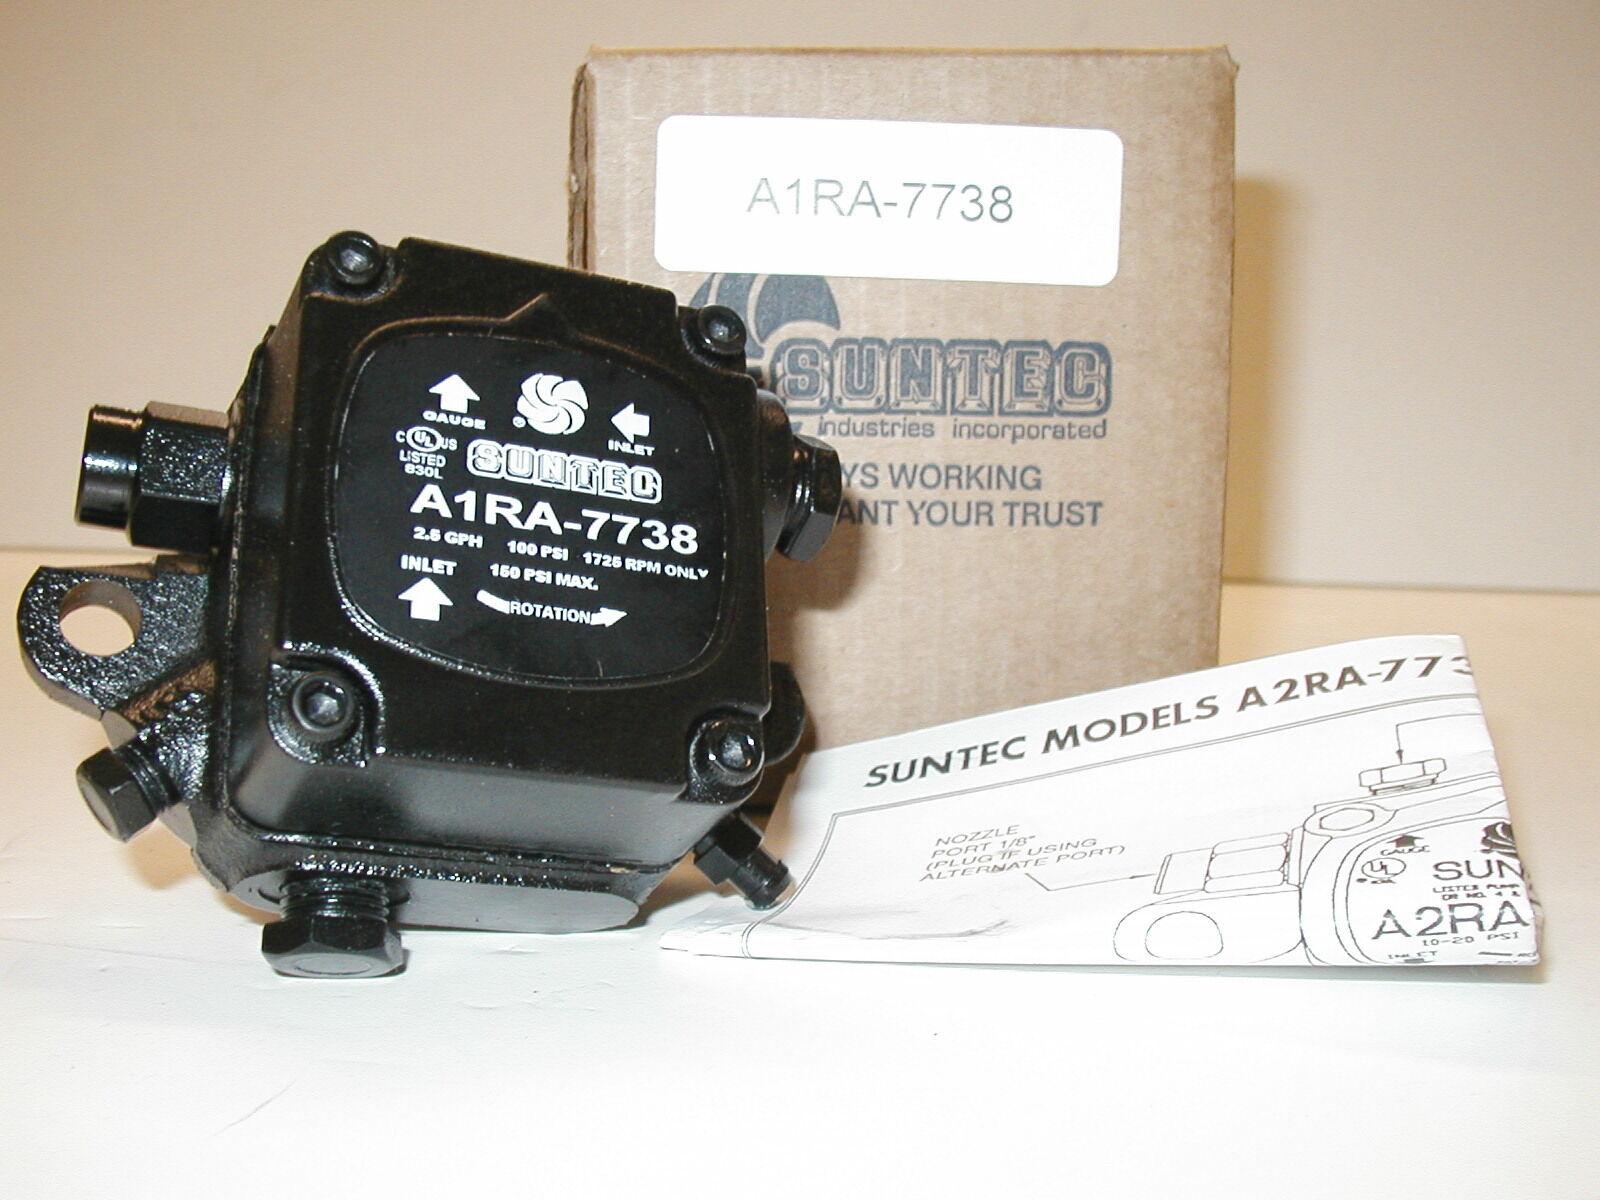 Suntec Or Sundstrand A1ra7738 One Year Warranty Waste Oil Heater Burner Pump